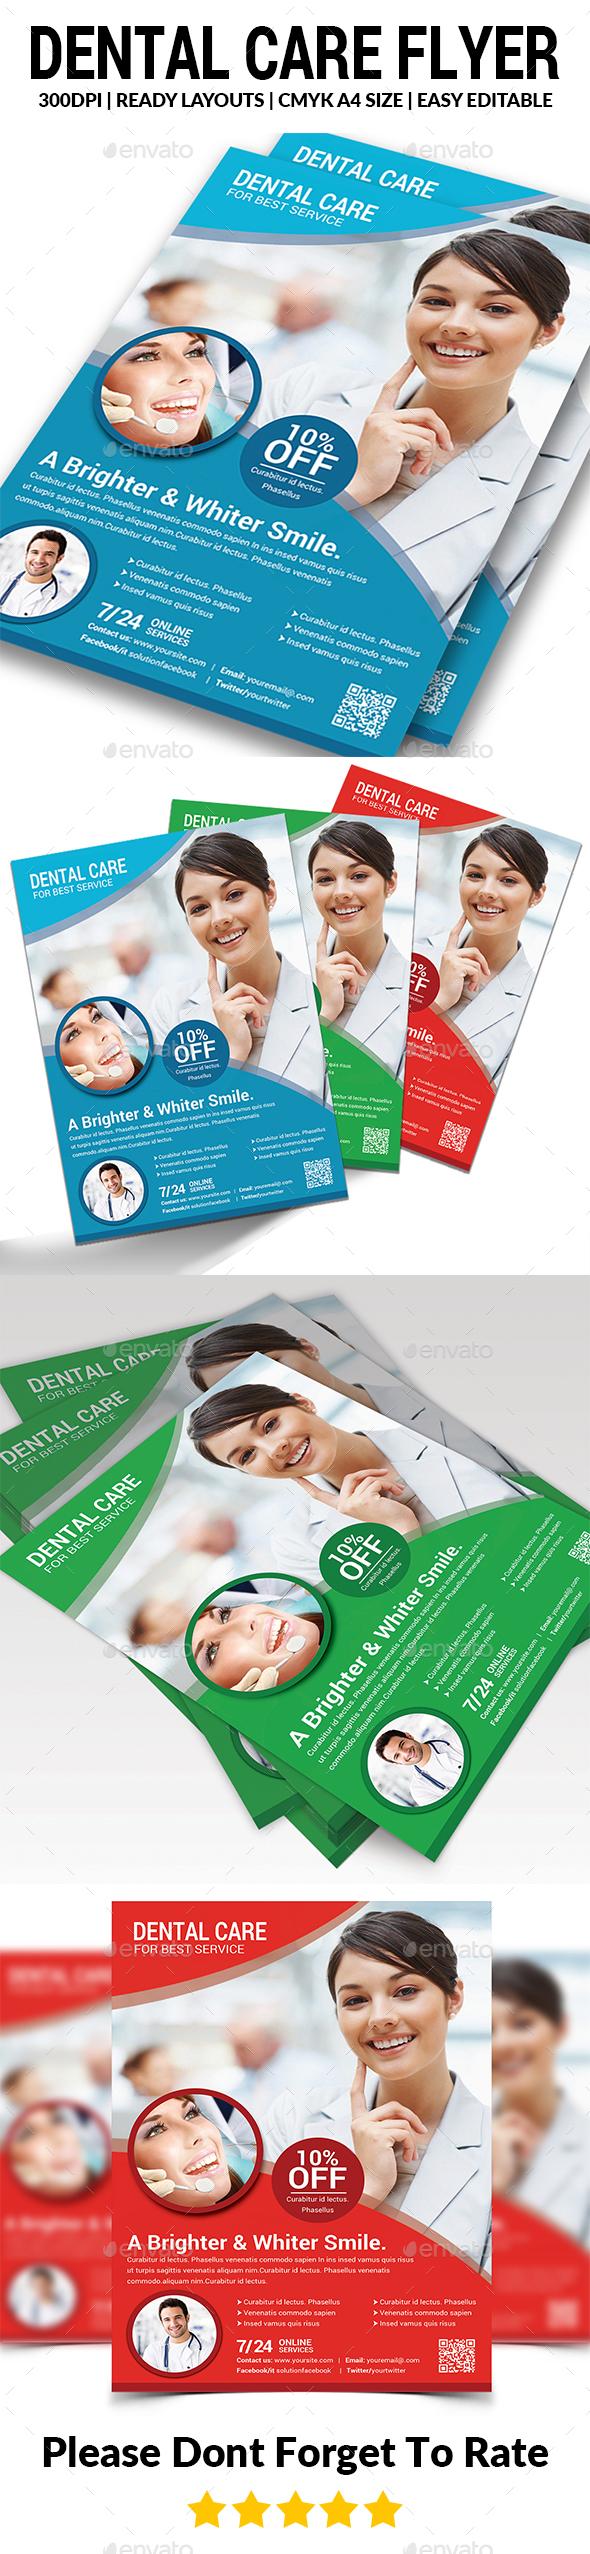 Dental Flyer - Corporate Flyers